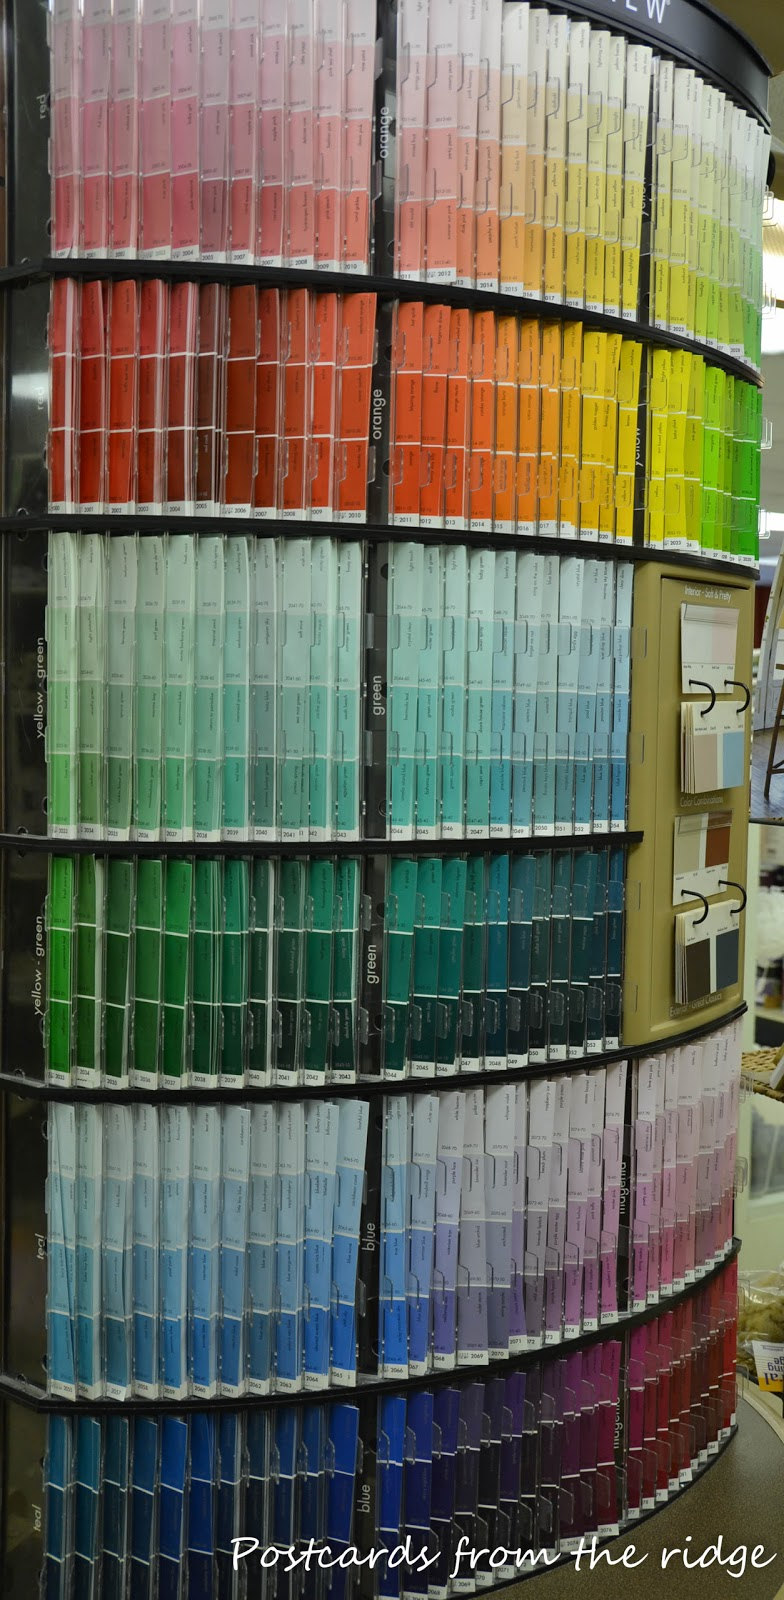 how to choose a paint colorPaint Color Advice How to choose a paint color  Postcards from